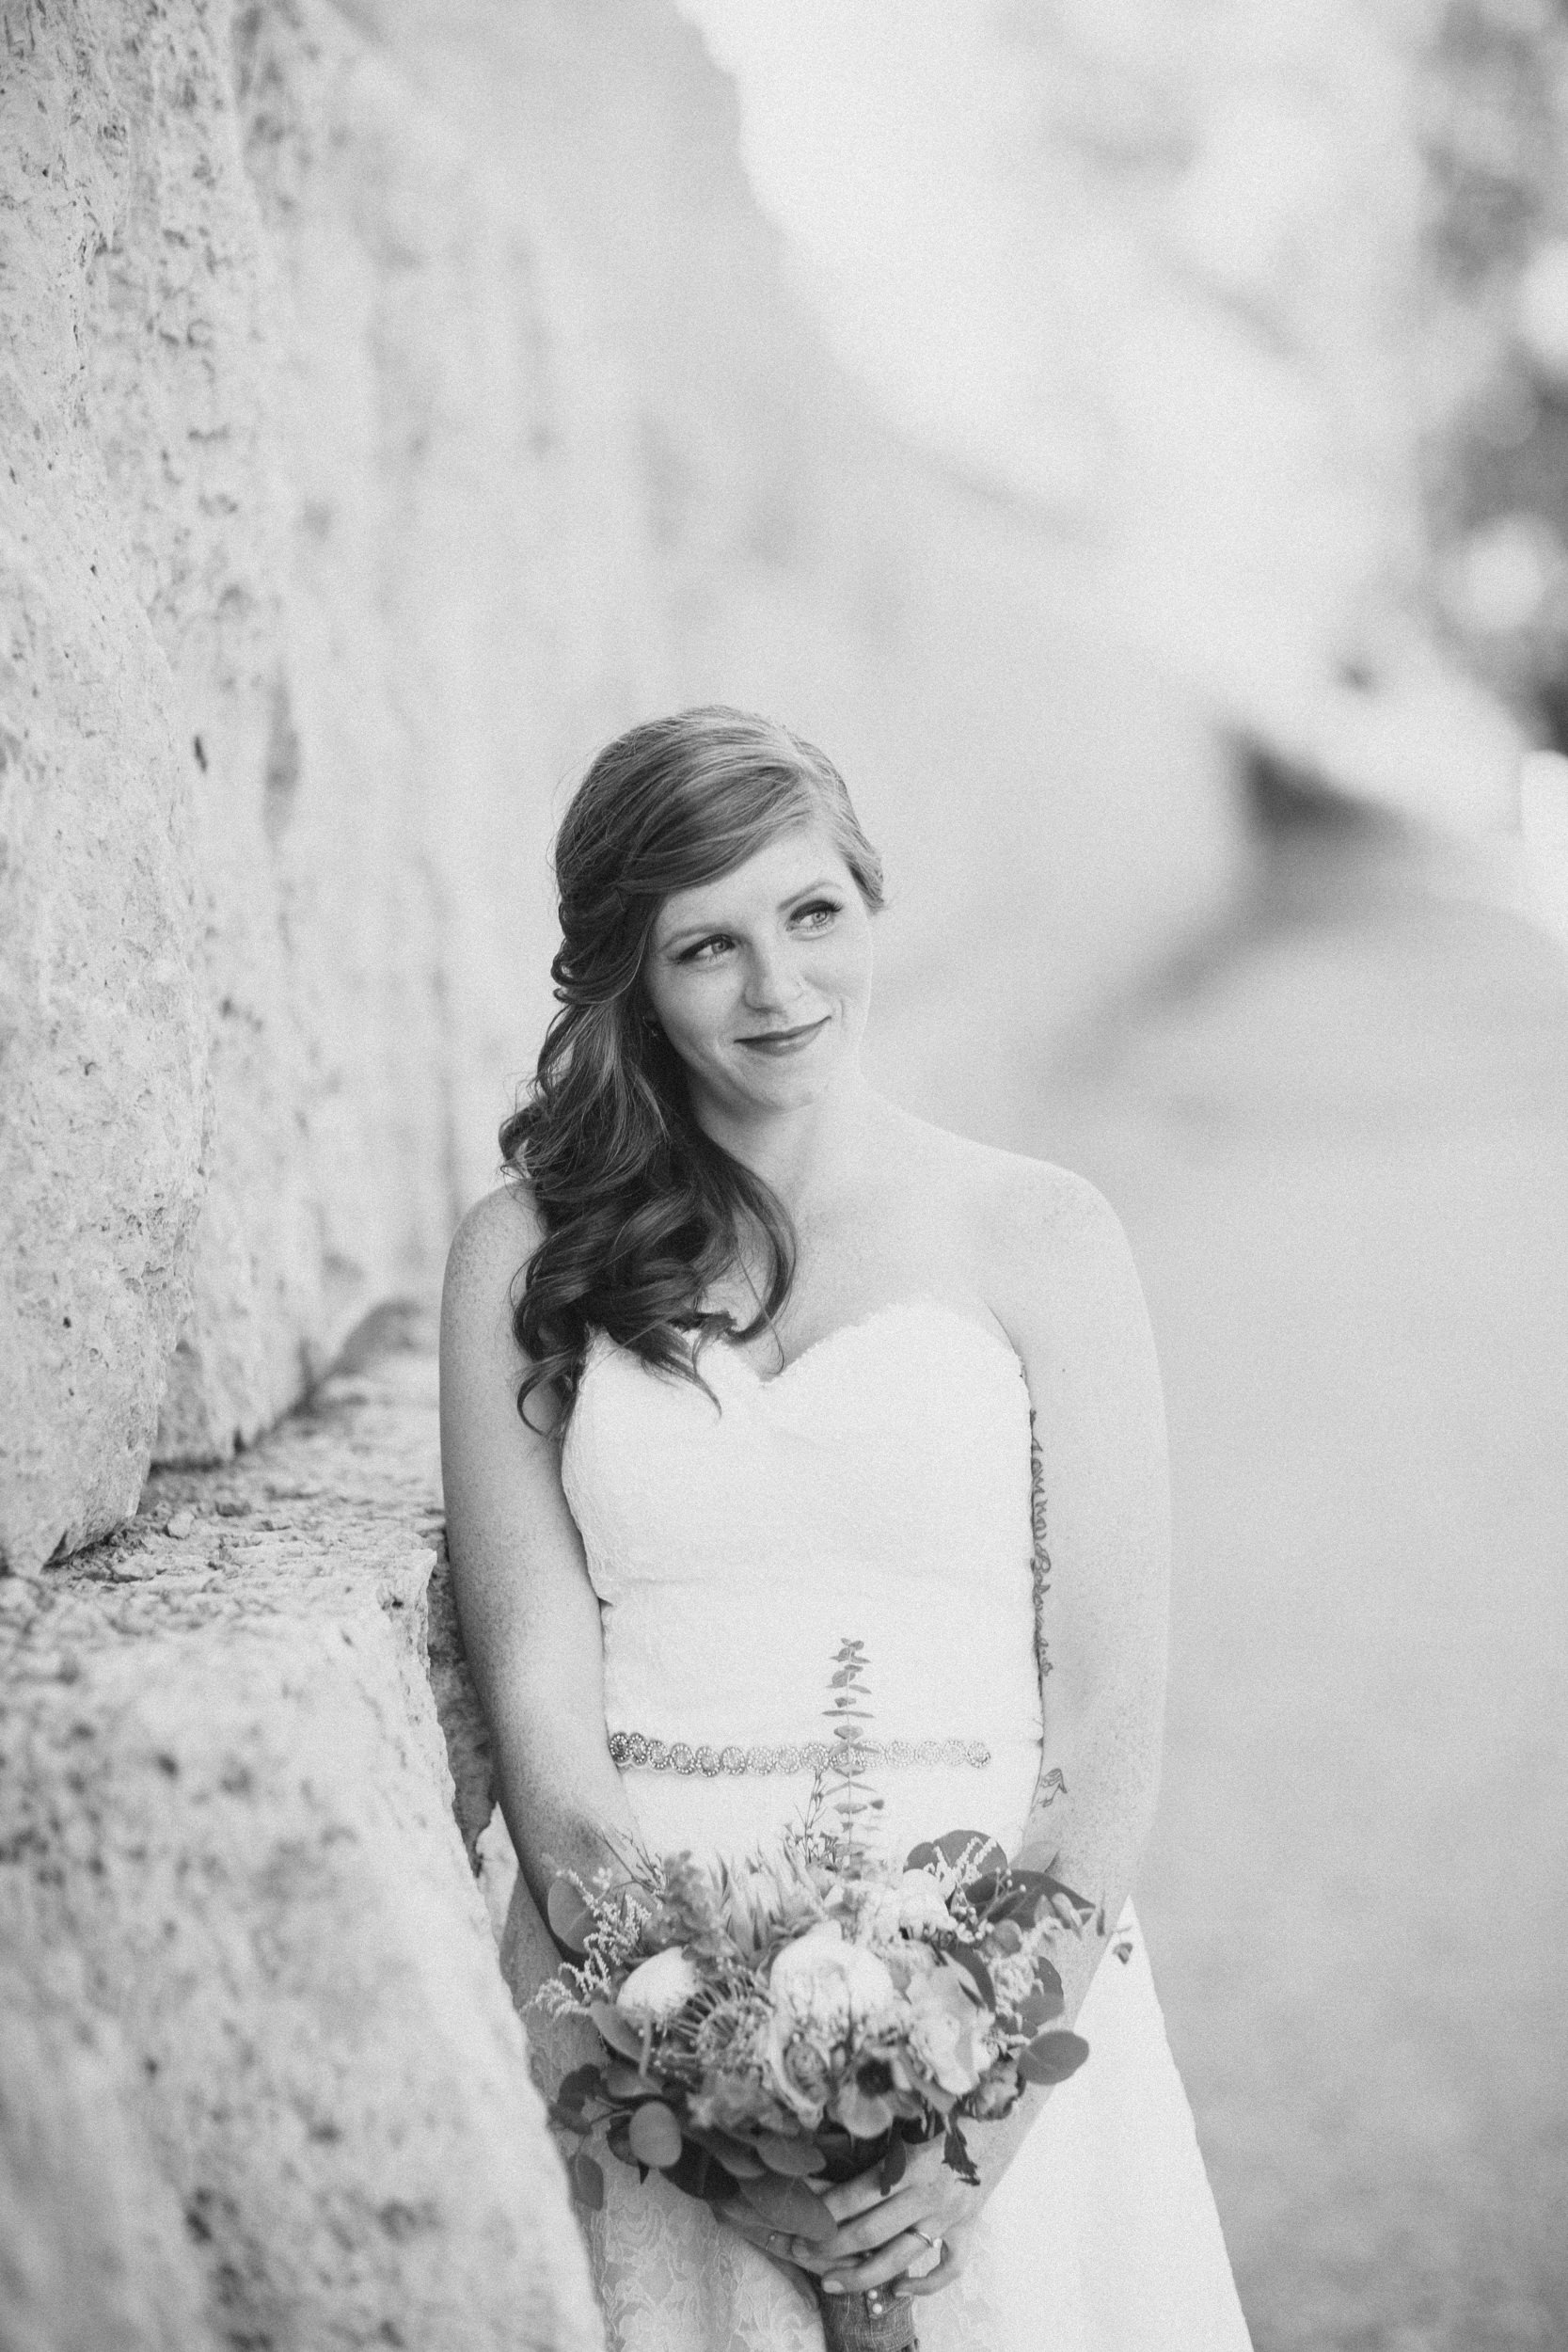 7-25-2015 Sarah and Jimmy's Eagle Ridge Downtown Galena Wedding-164.jpg